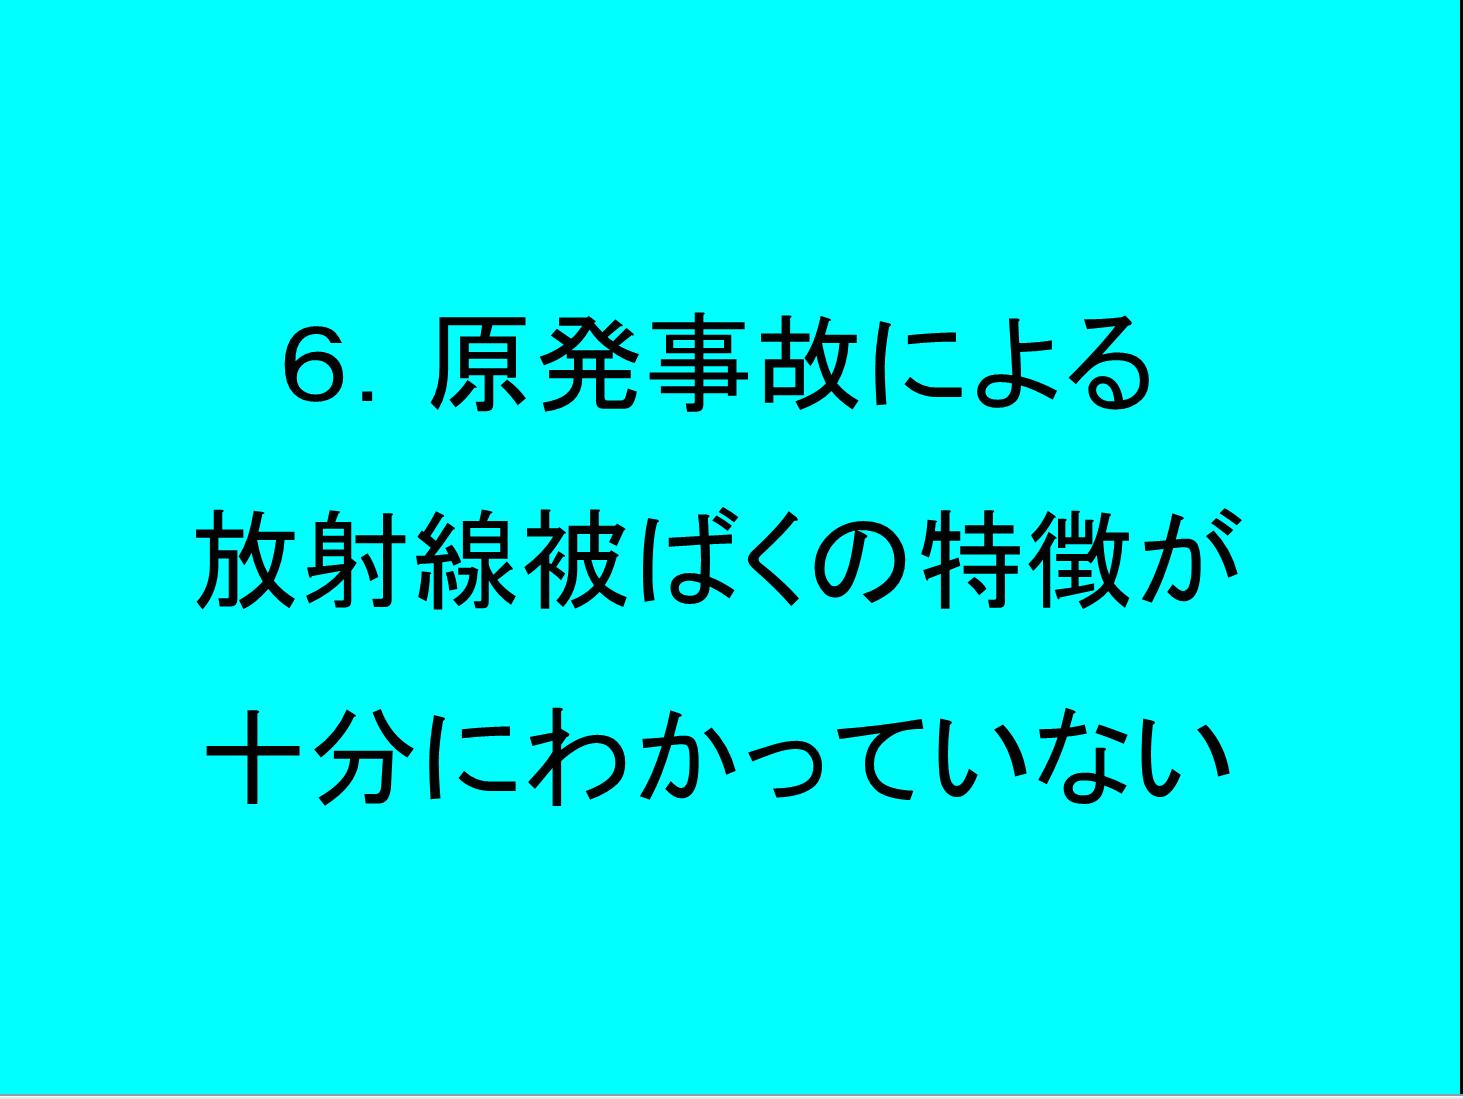 DrMatsuzaki108.png